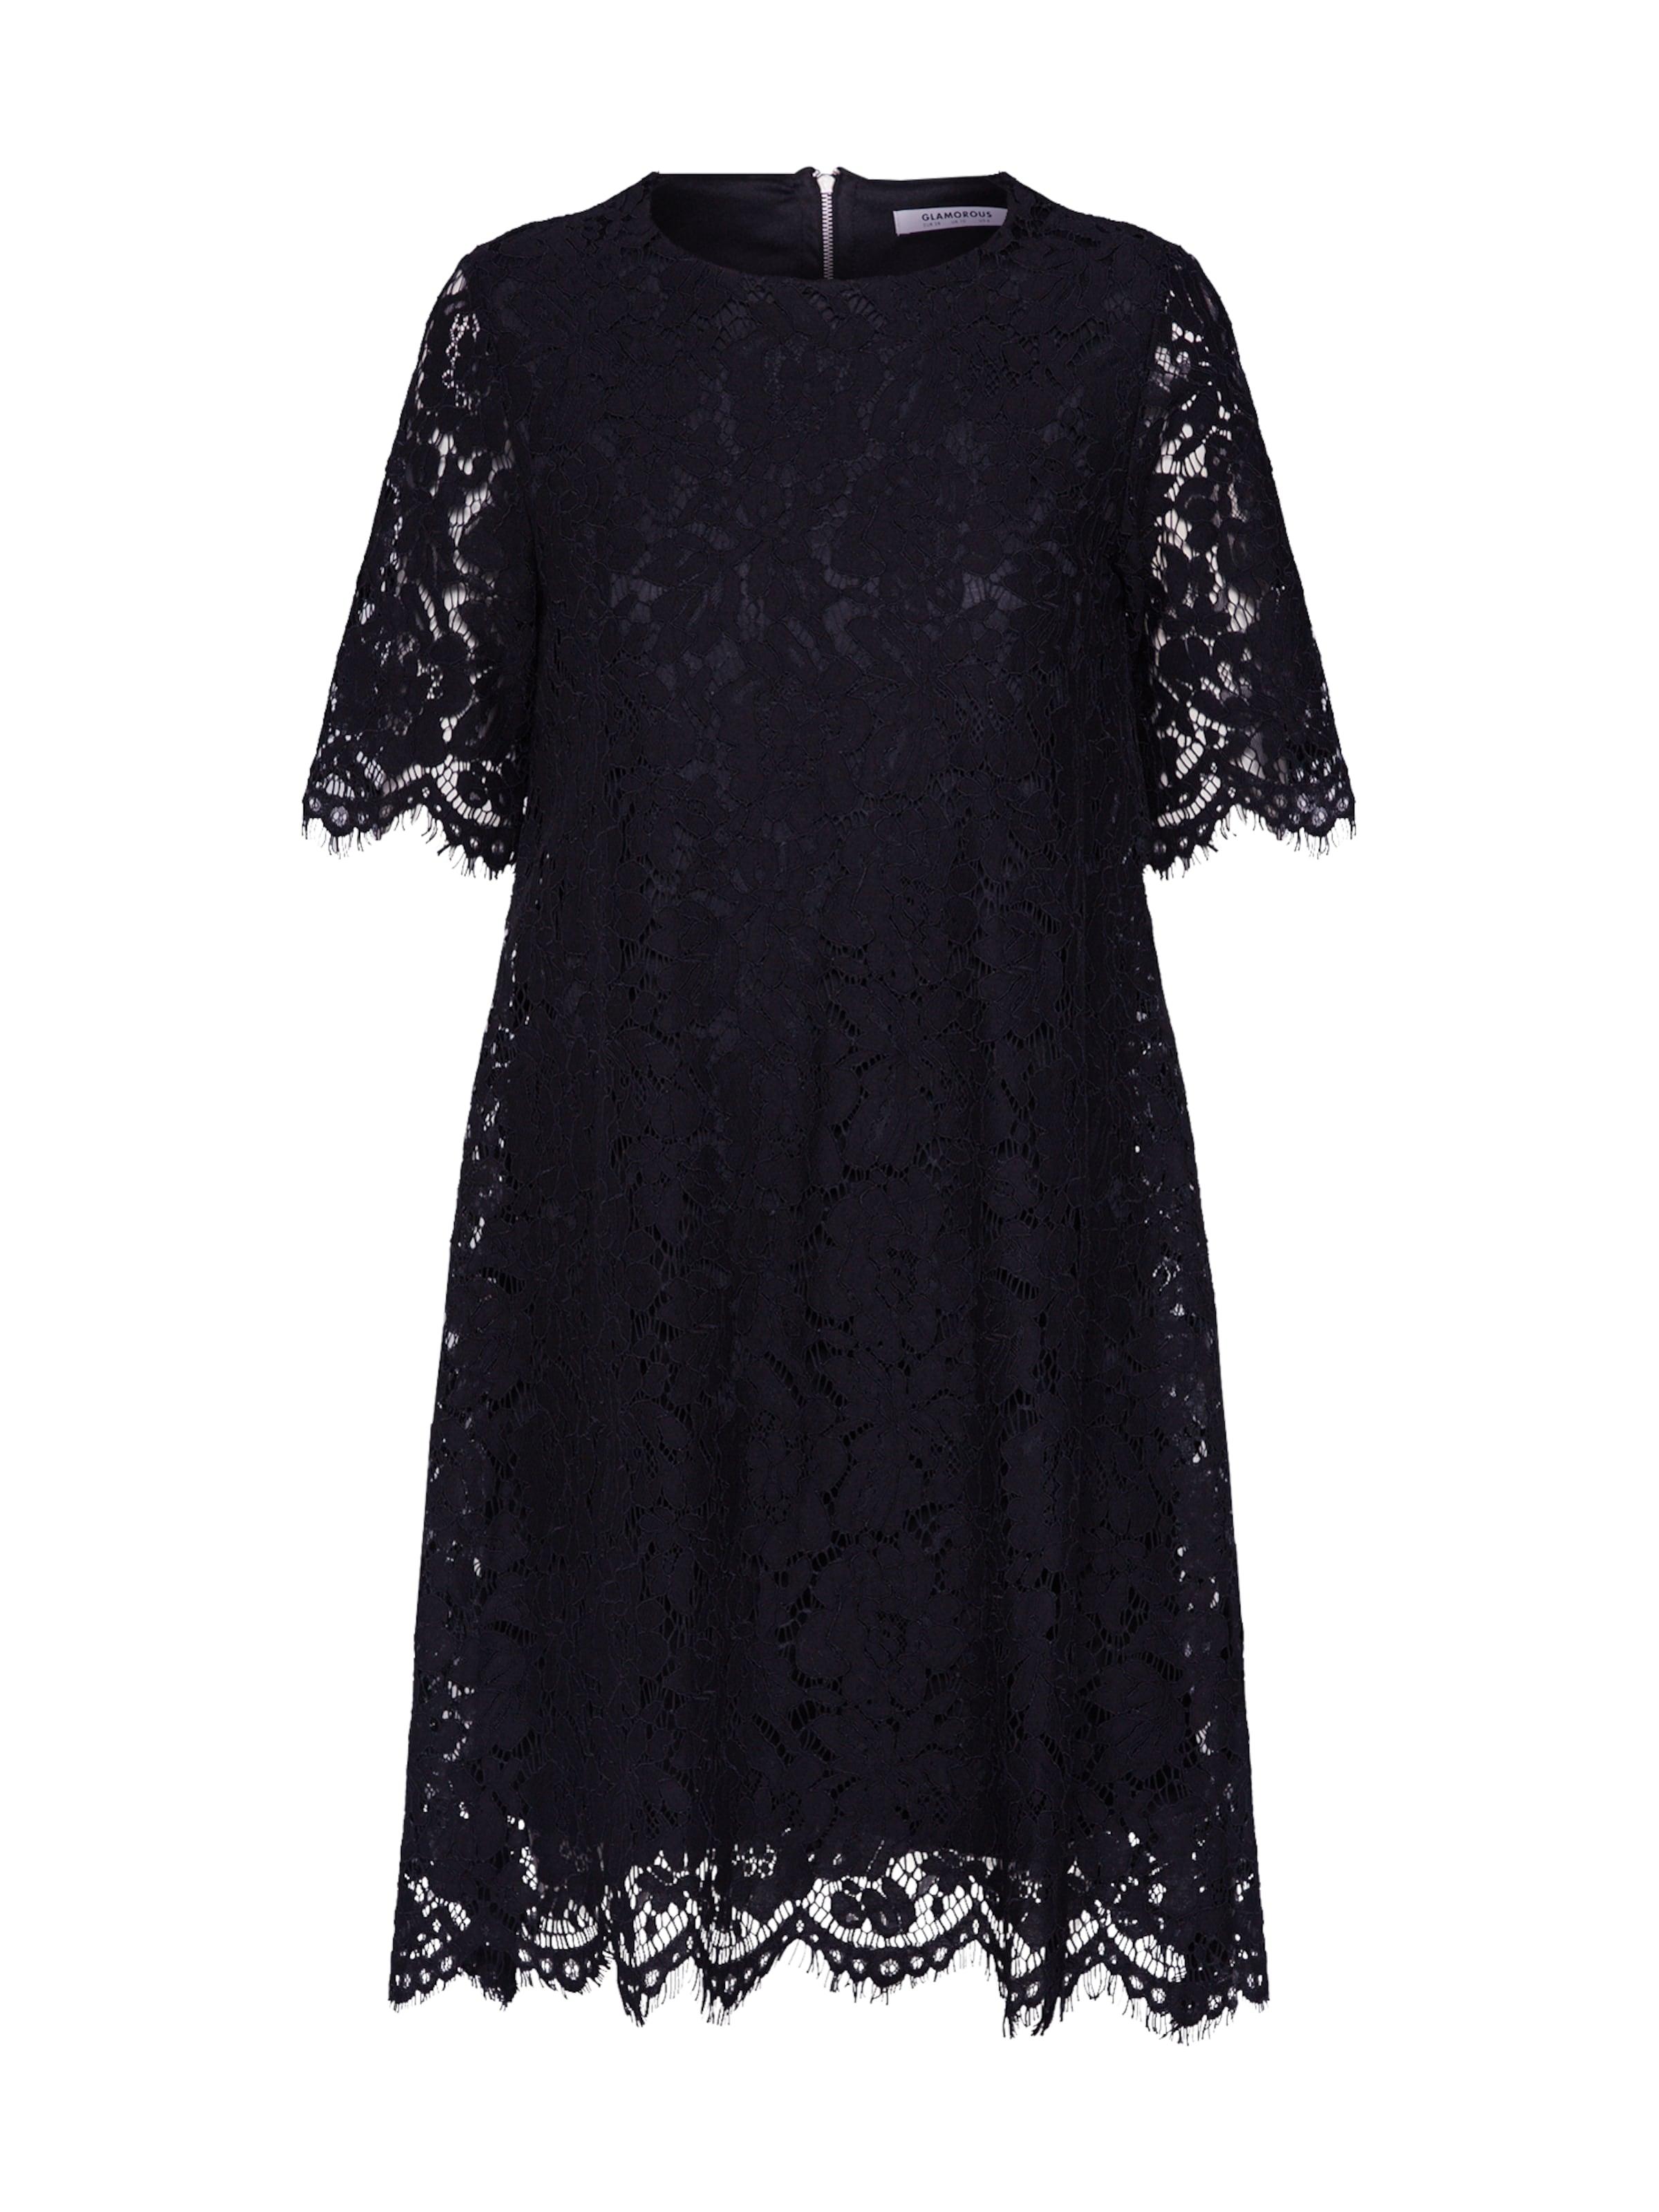 En Glamorous Robe Glamorous Robe Noir 'ka5387' 50qwgISn